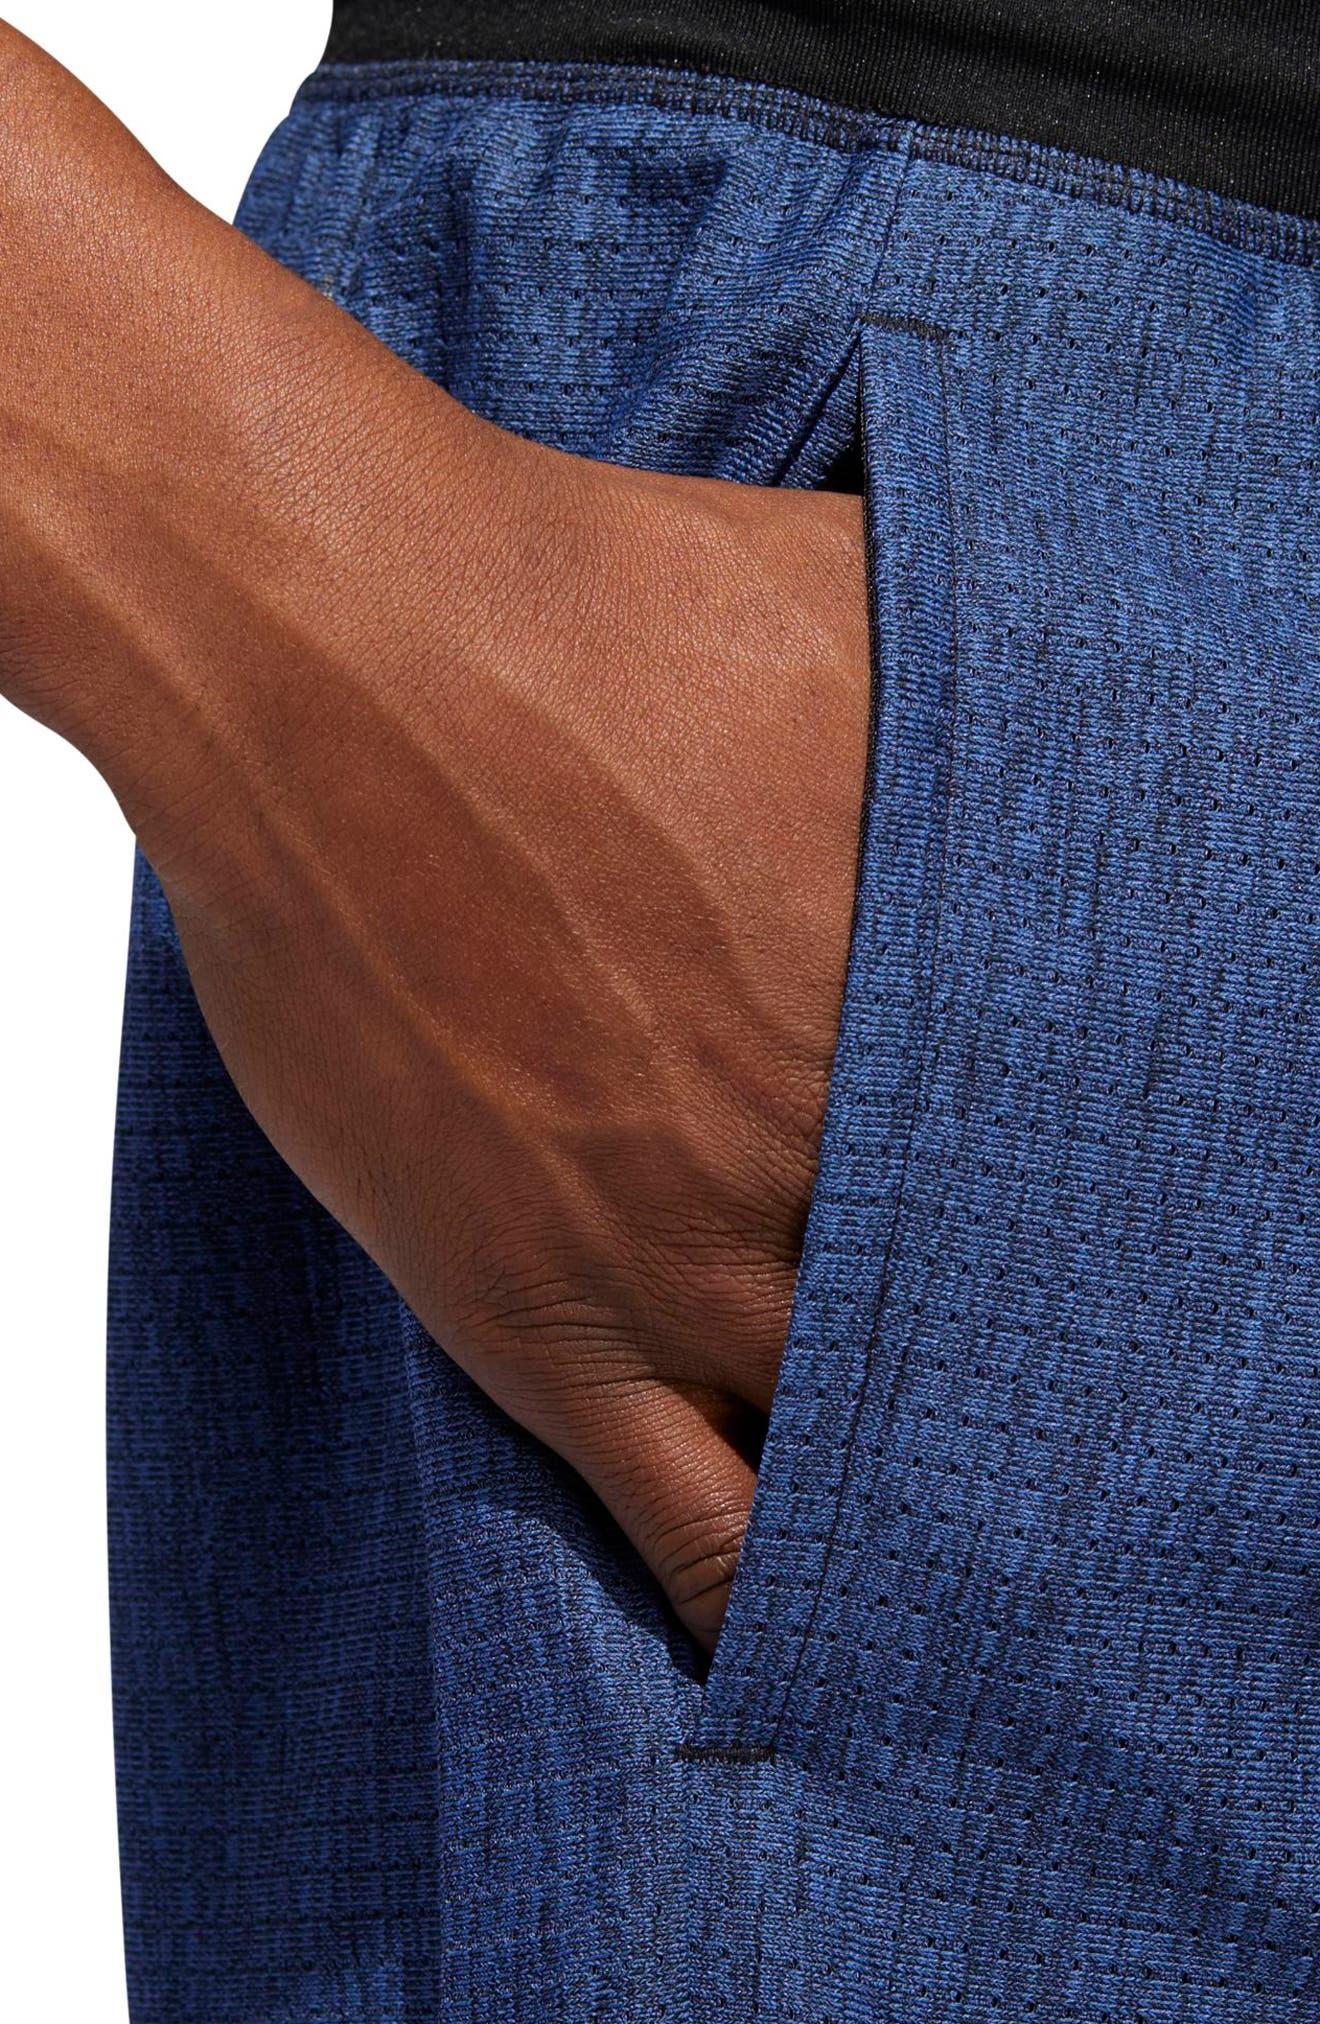 Speedbreaker Shorts,                             Alternate thumbnail 4, color,                             Hi-Res Blue